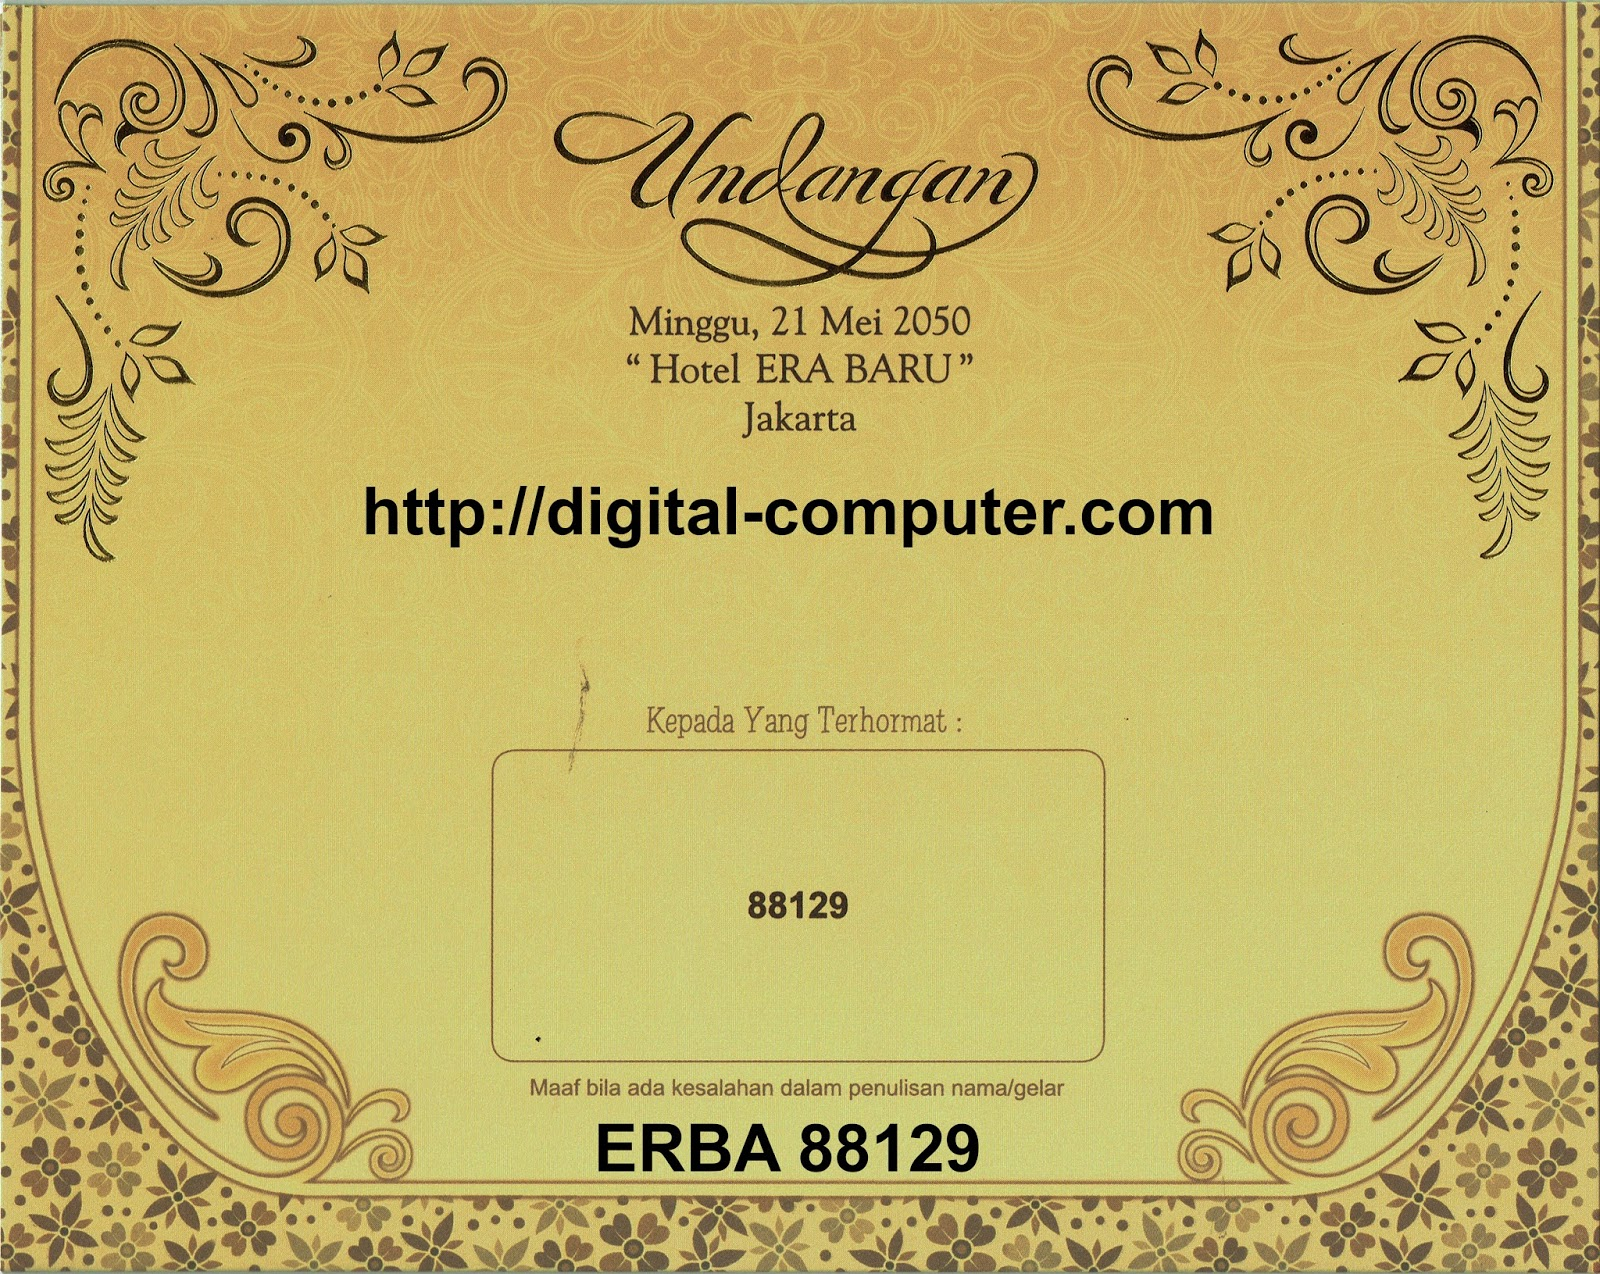 Undangan Softcover ERBA 88129